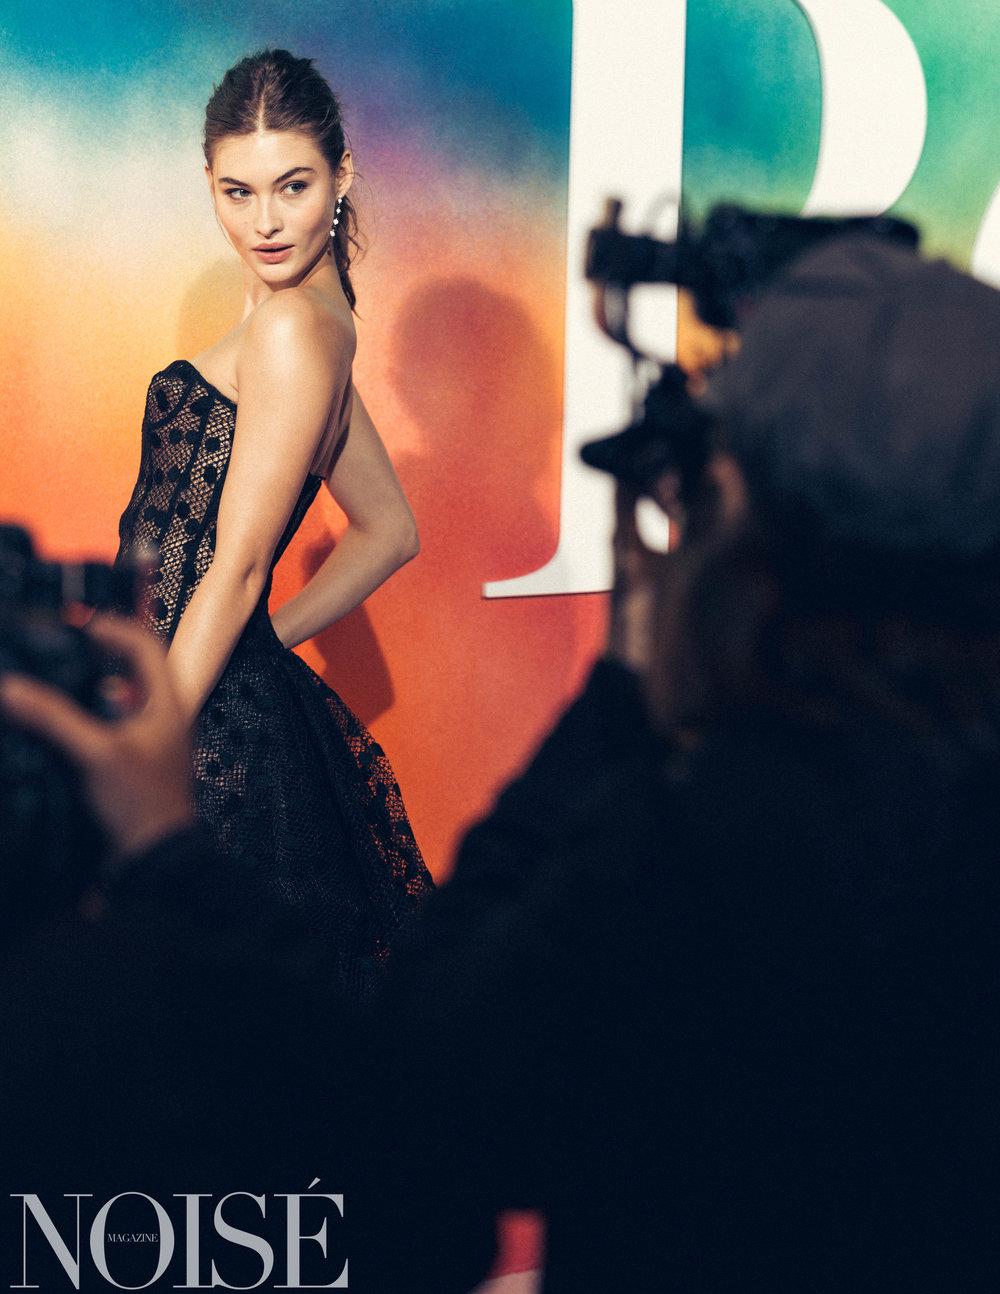 Grace Elizabeth wearing Oscar de la Renta at BoF 500 gala, Photograph by Siyu Tang for NOISÉ